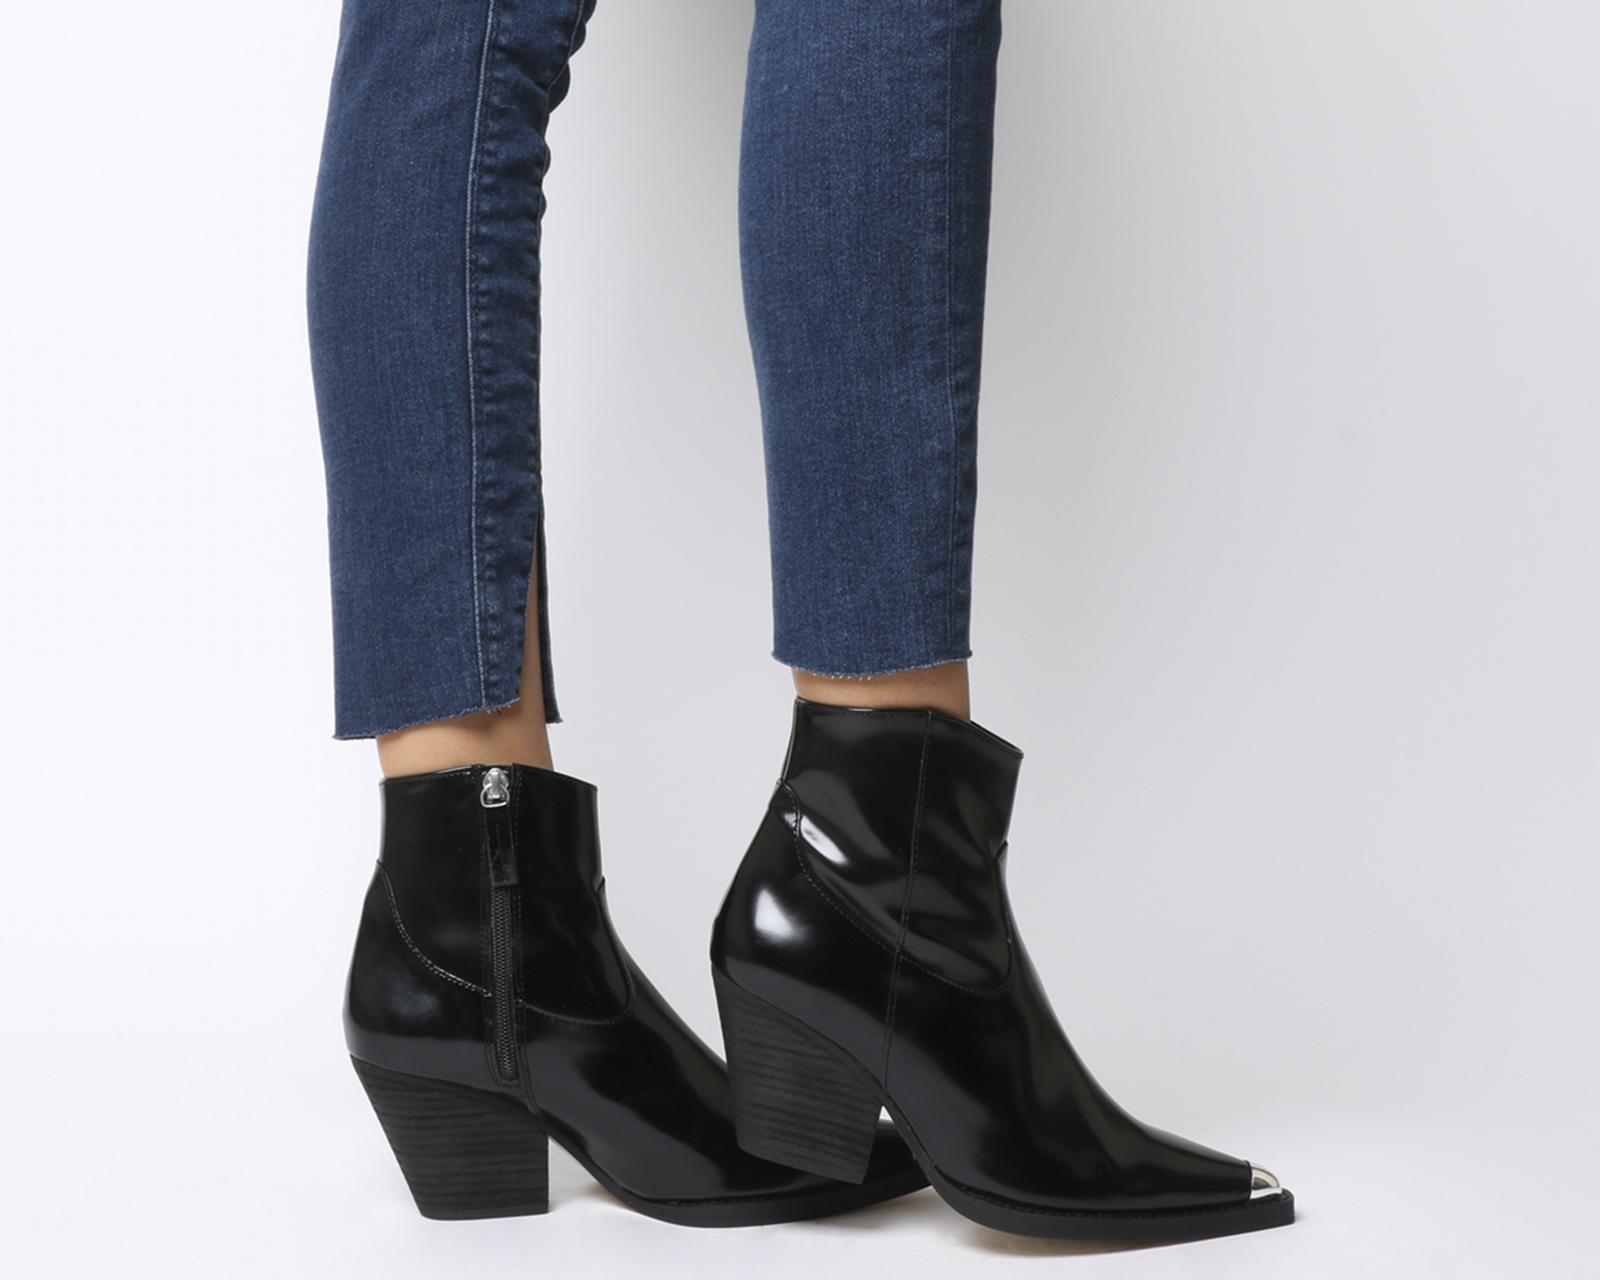 Botas para mujer extremo oeste de oficina arriba Negro Con Puntera Botas